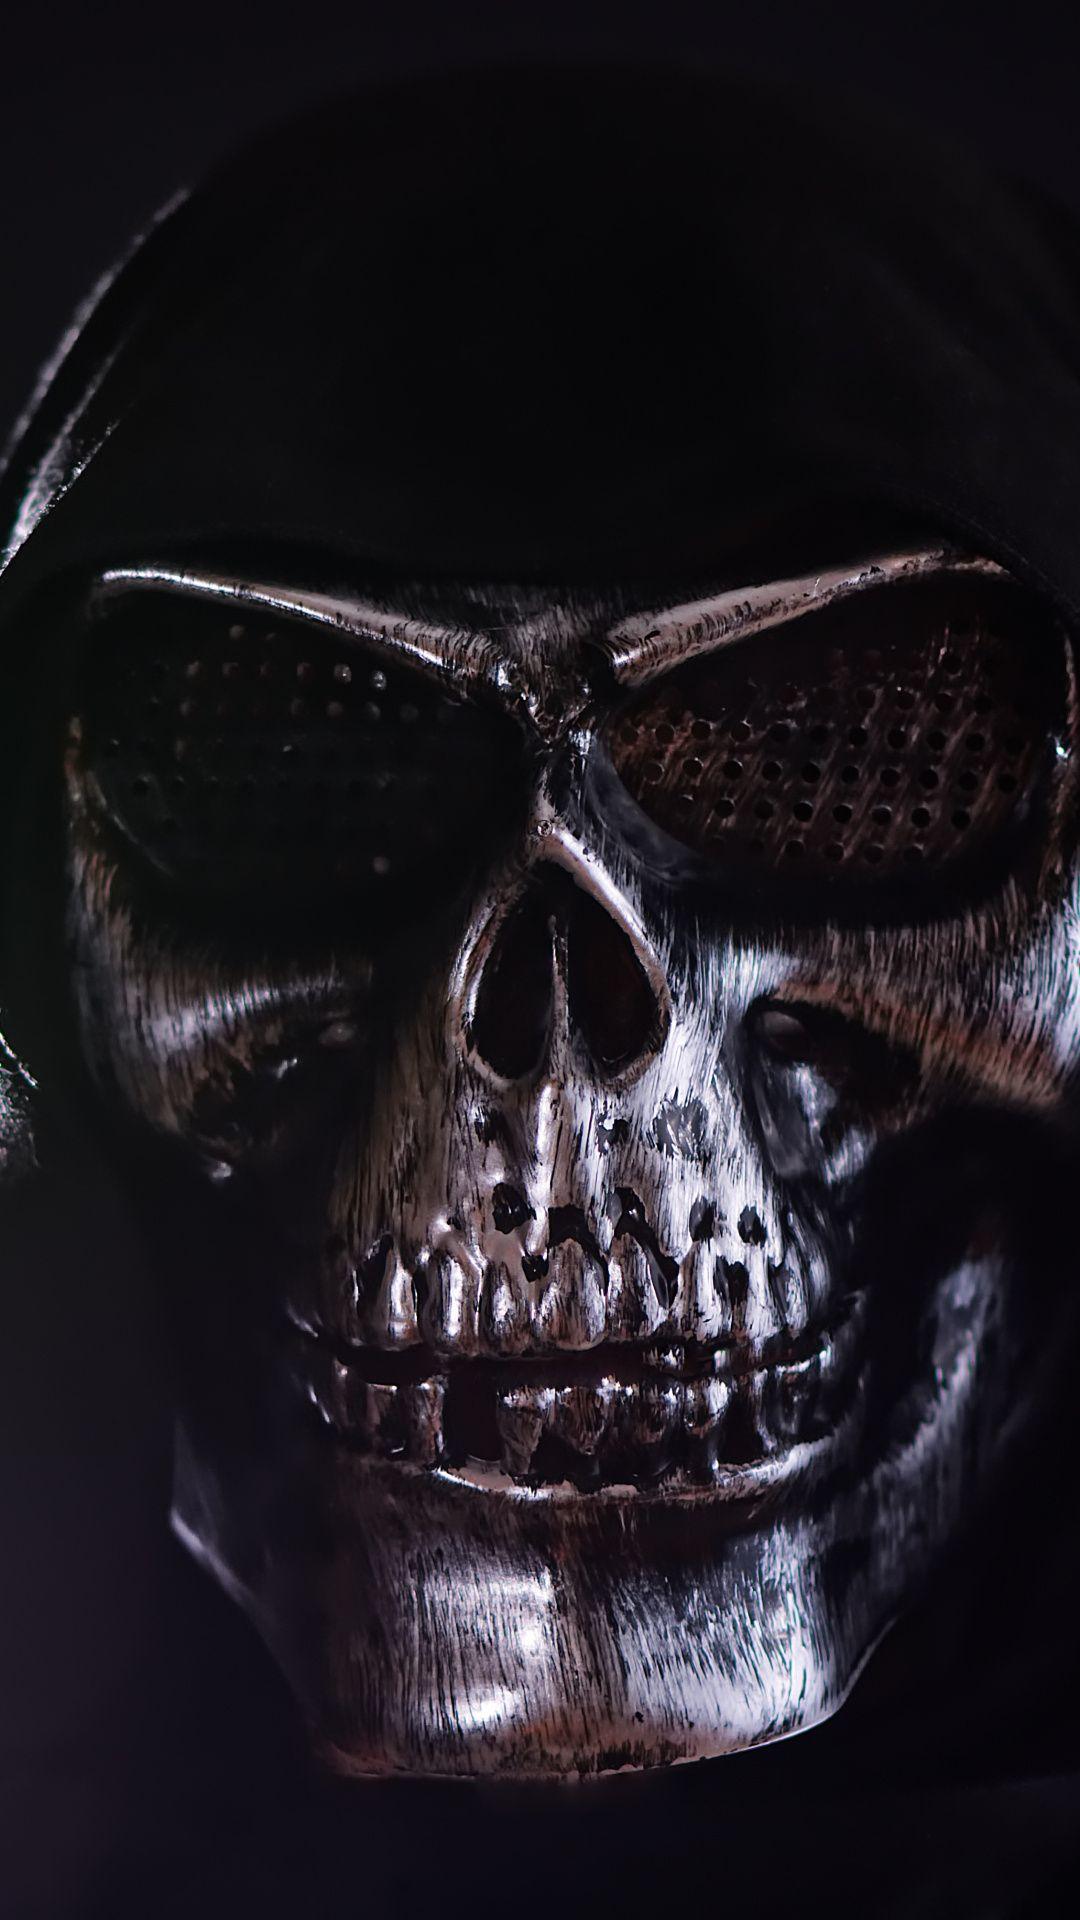 Wallpapers horror, black, evil, darkness, anime